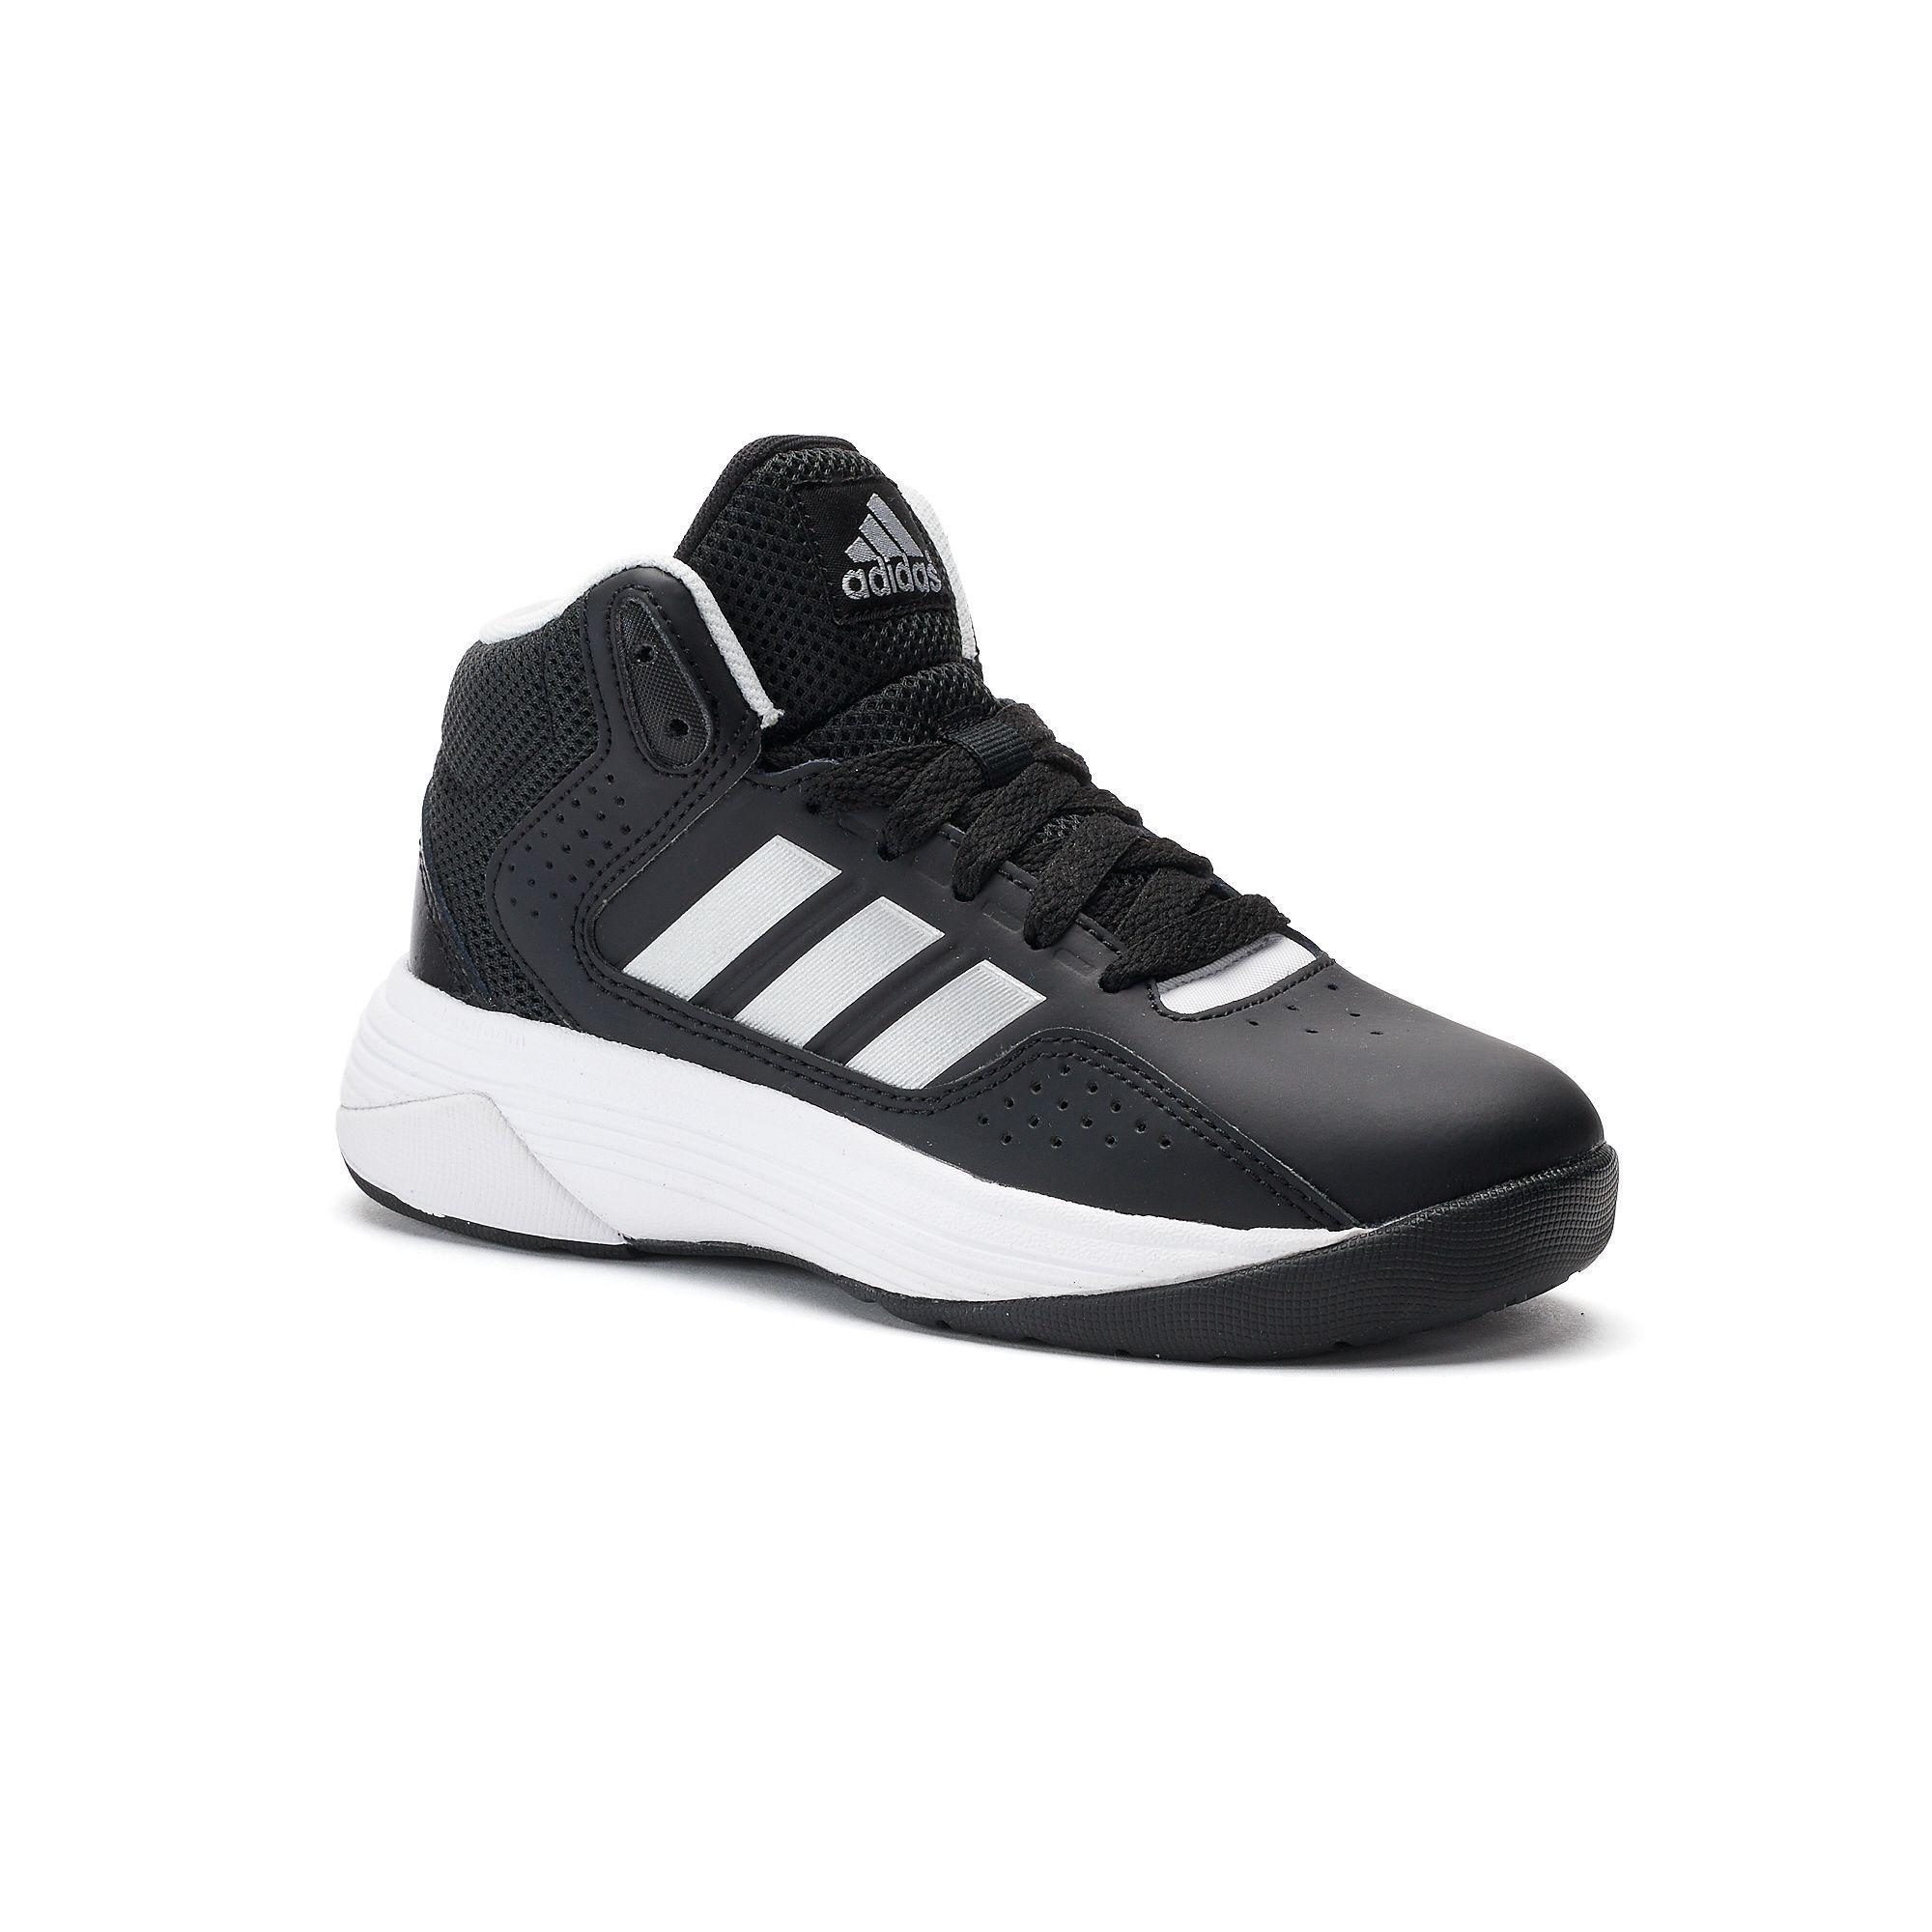 adidas cloudfoam ilation metà bambini, scarpe da basket prodotti